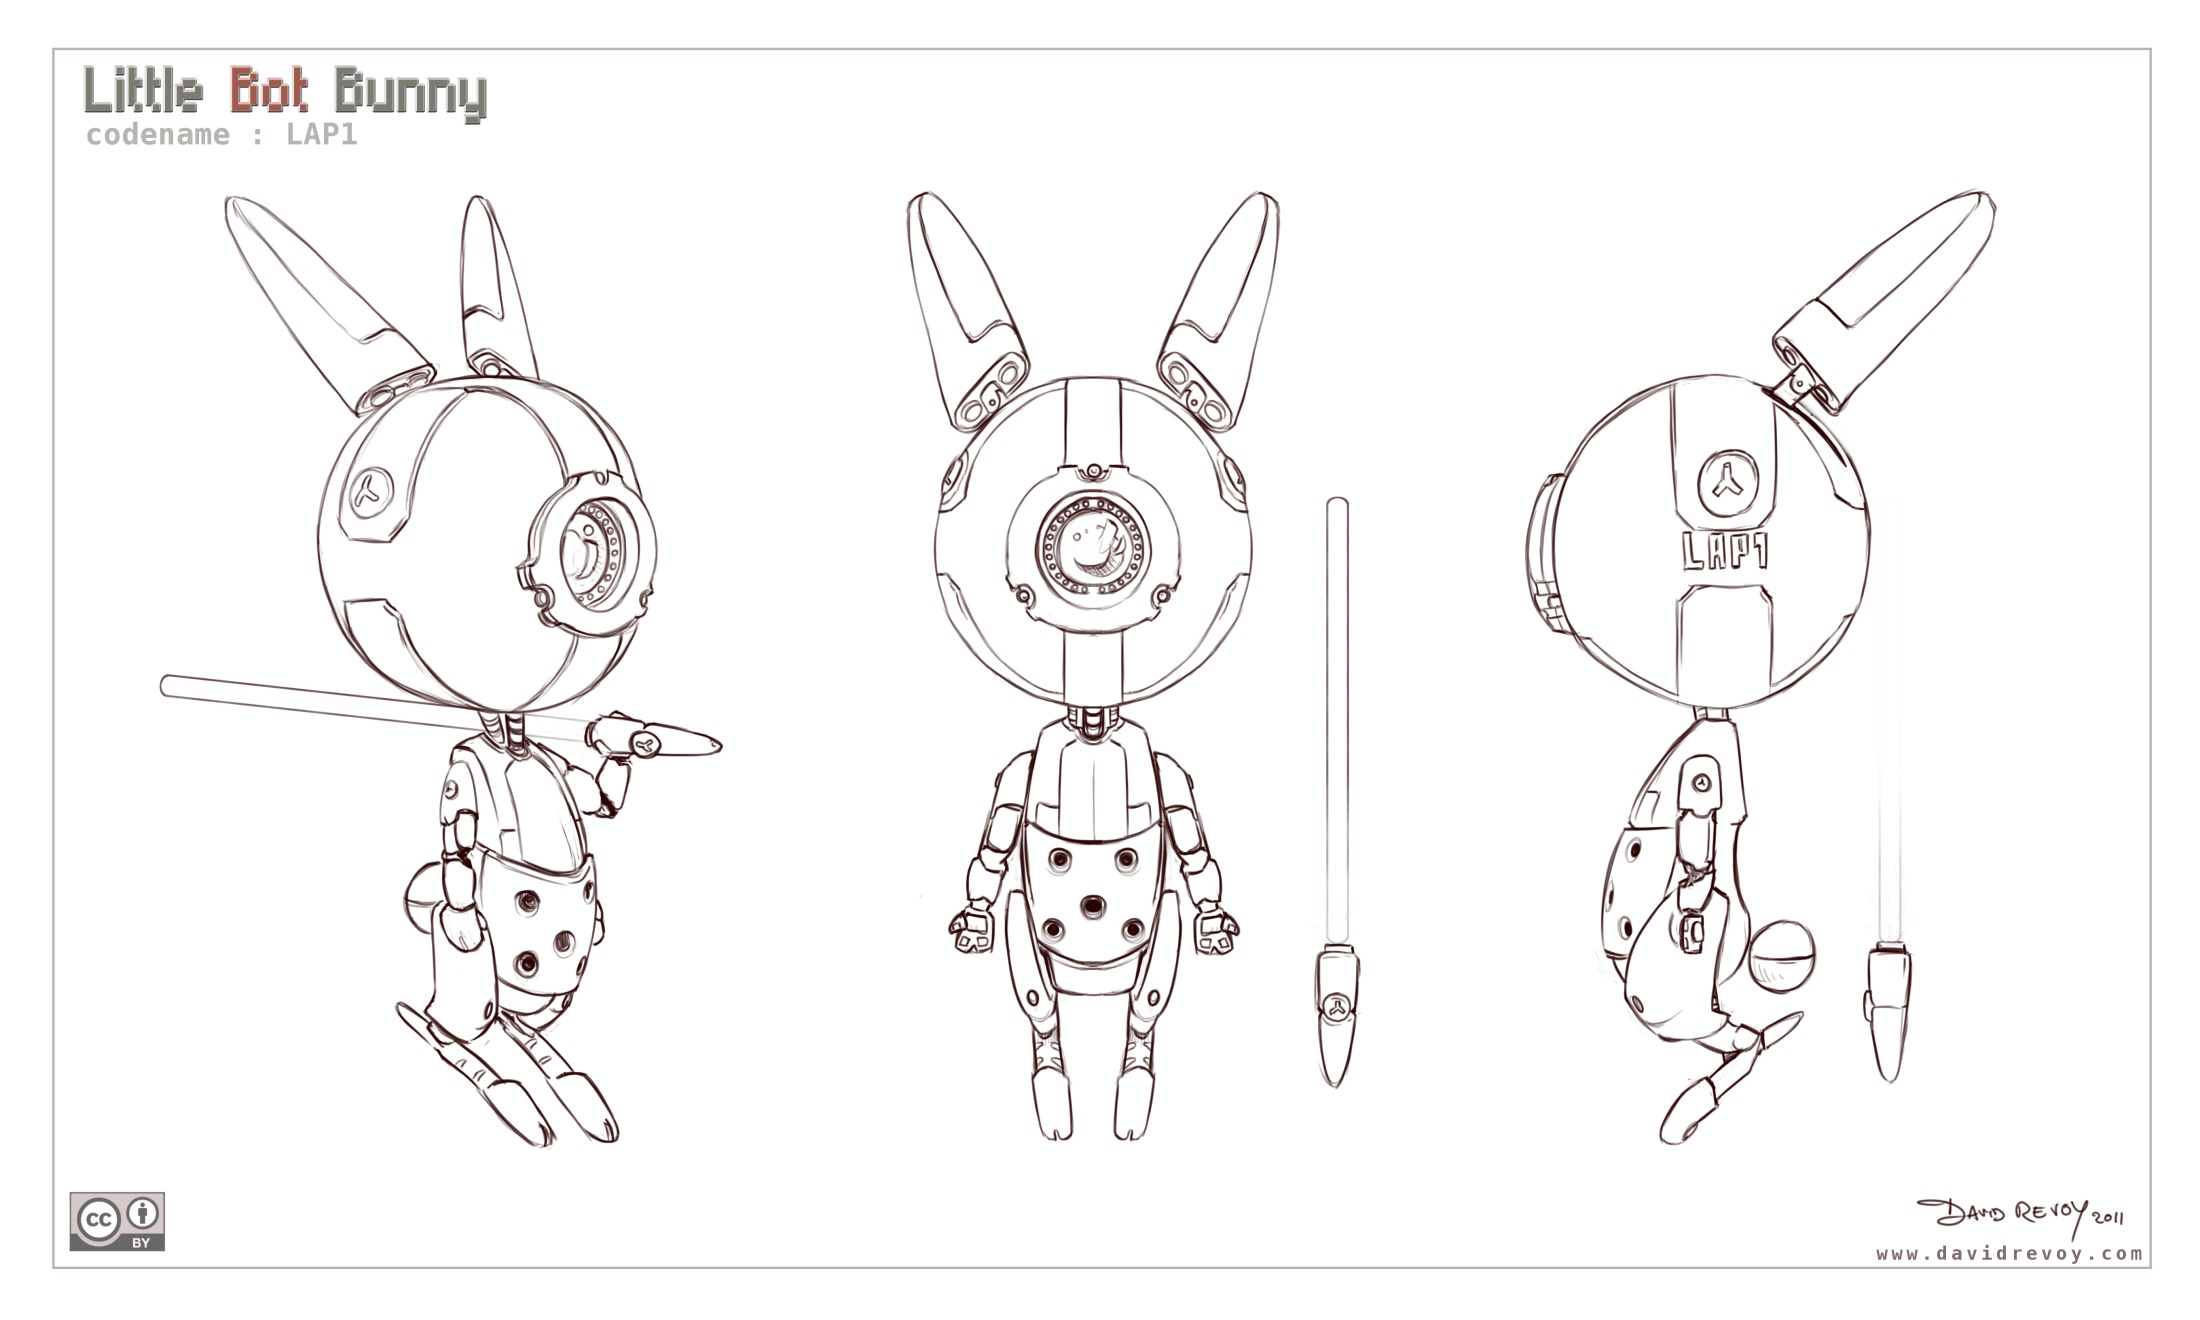 2200x1320 Free 3d Model Sheet Little Bot Bunny